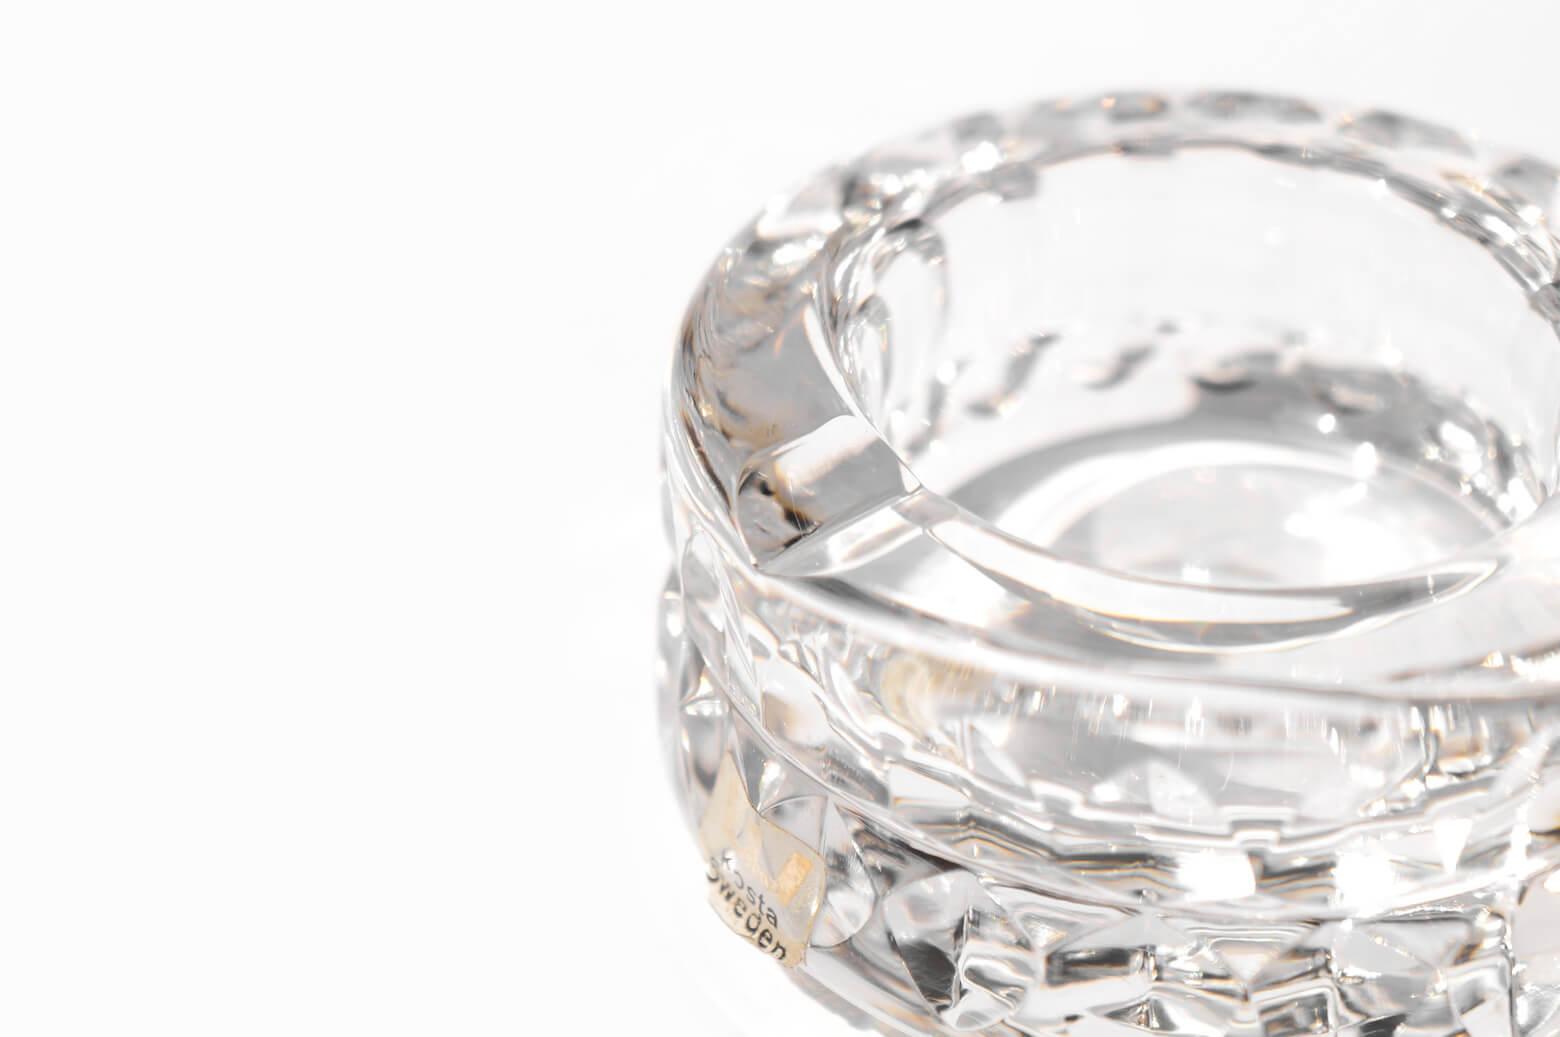 Kosta Sweden Ash Tray Goran Warff/コスタ スウェーデン アッシュトレイ ヨーラン・ヴァルフ クリスタルガラス 北欧雑貨 ヴィンテージ